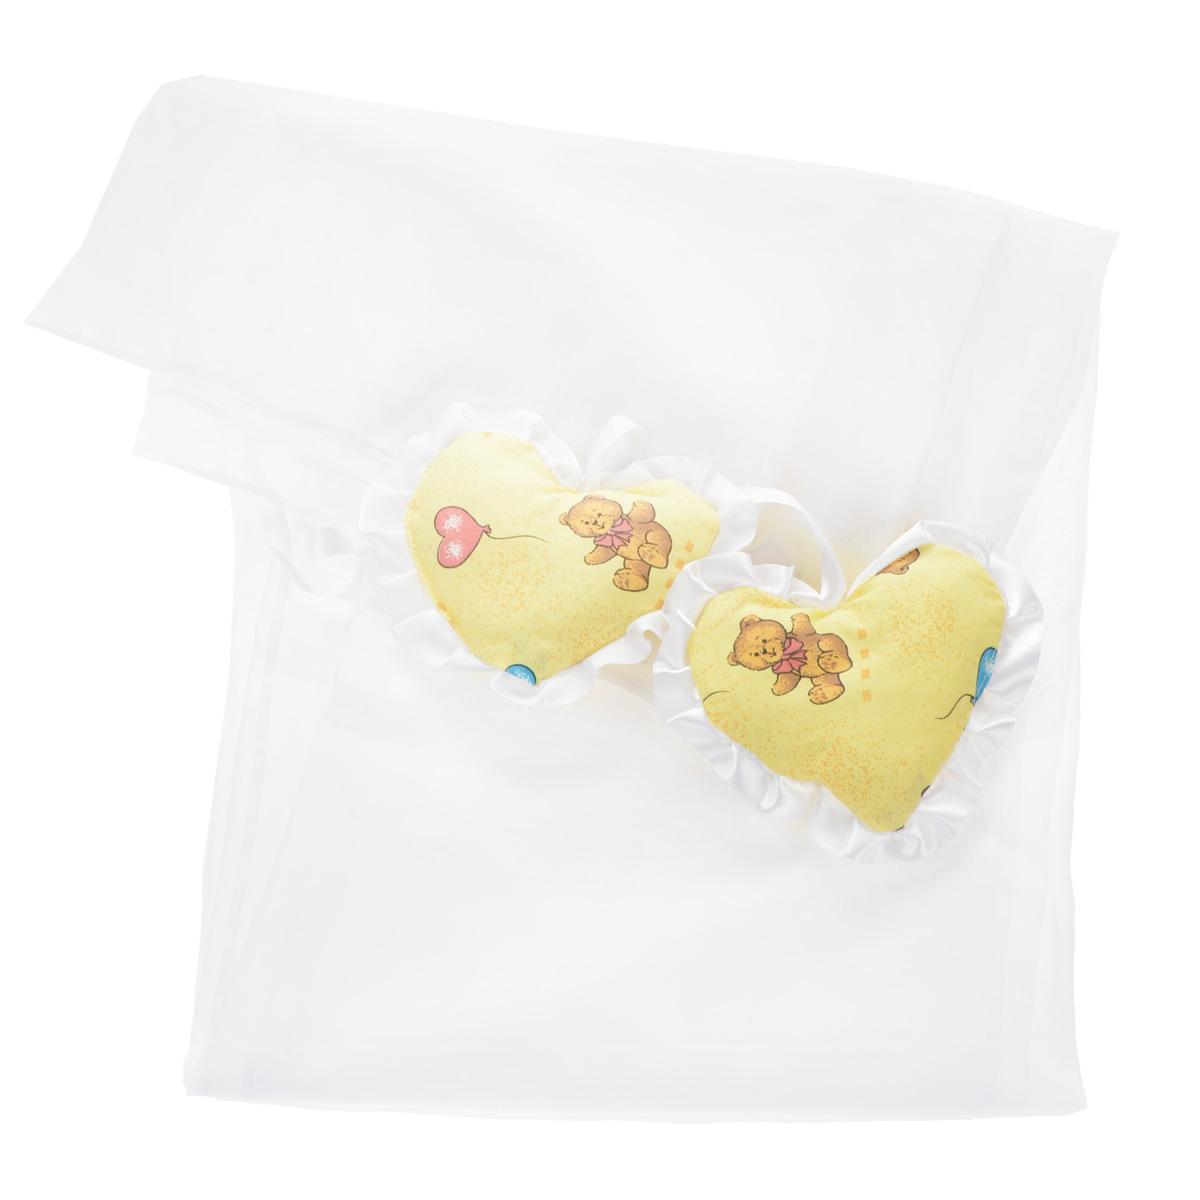 Балдахин Фея, цвет: белый, желтый, 250 см х 150 см